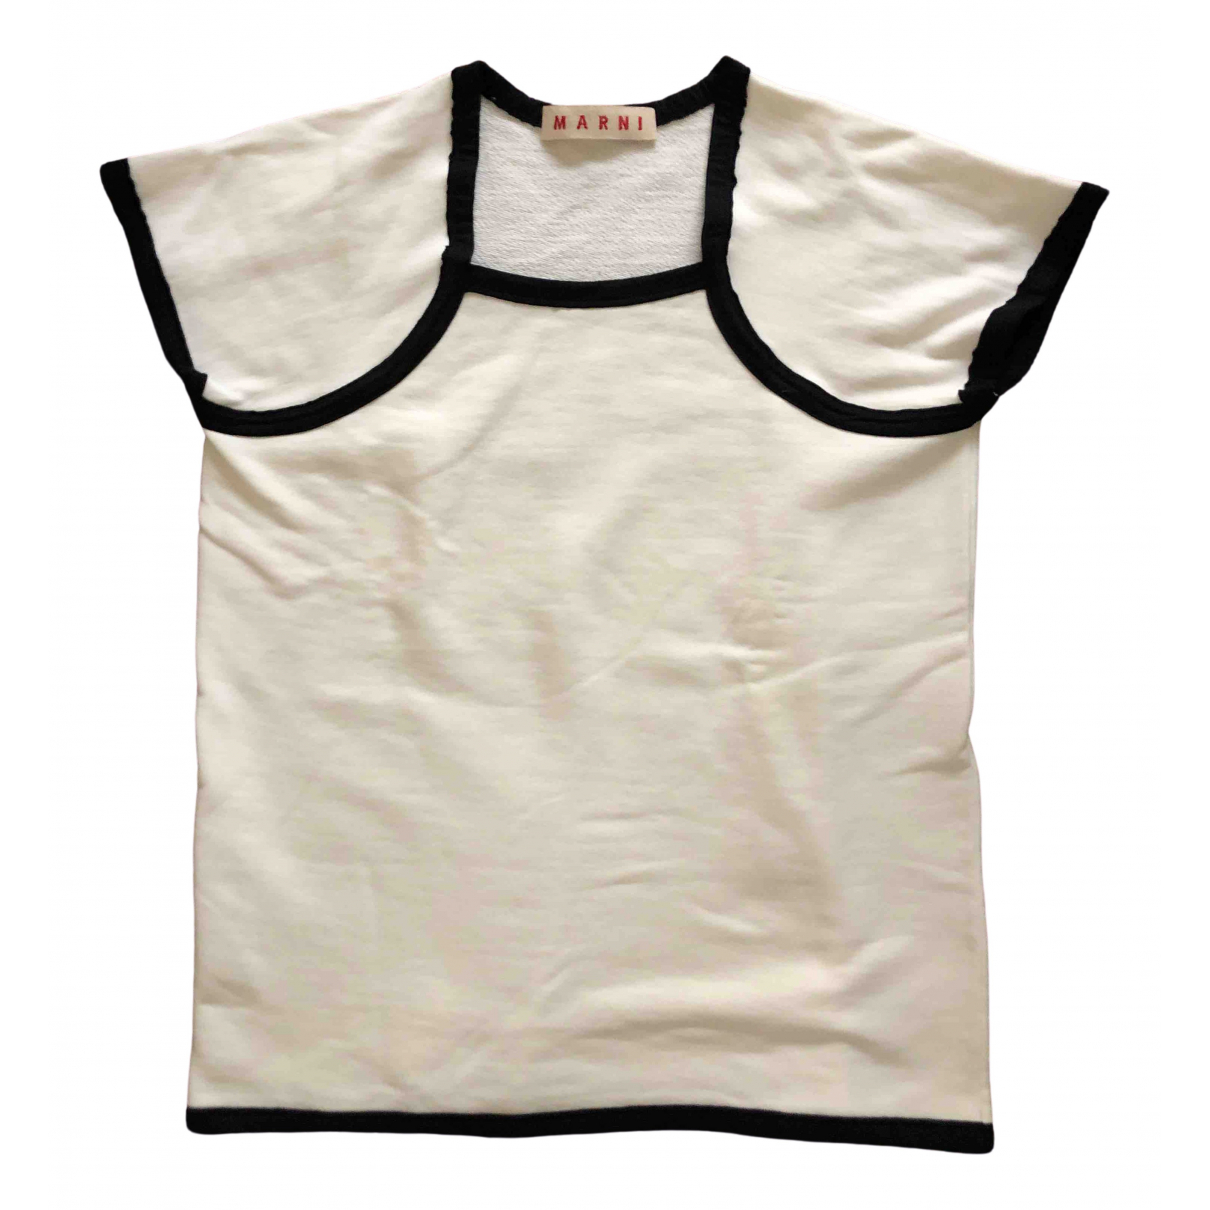 Camiseta Marni